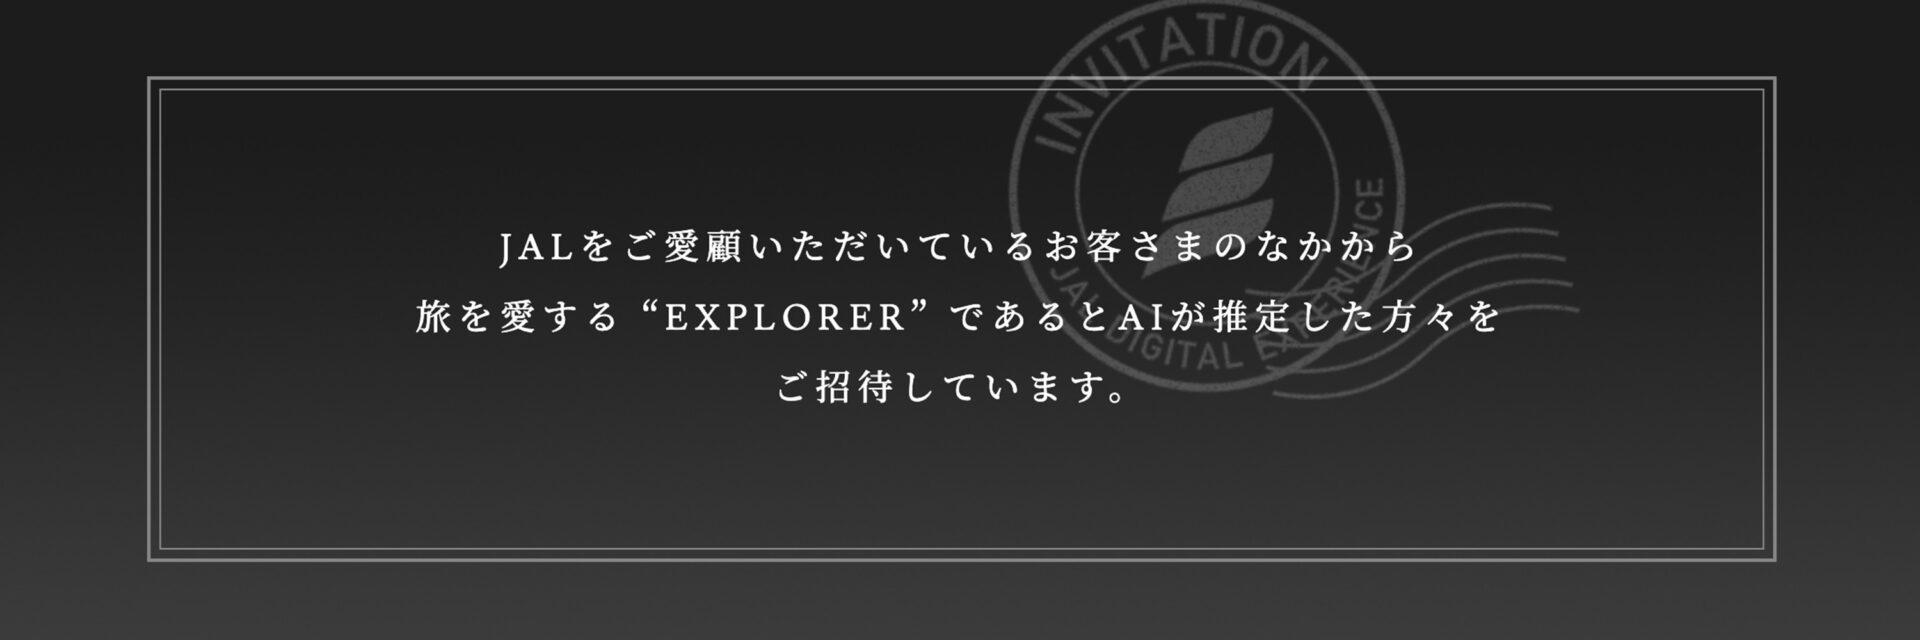 JAL CLASS EXPLORER ご招待メール